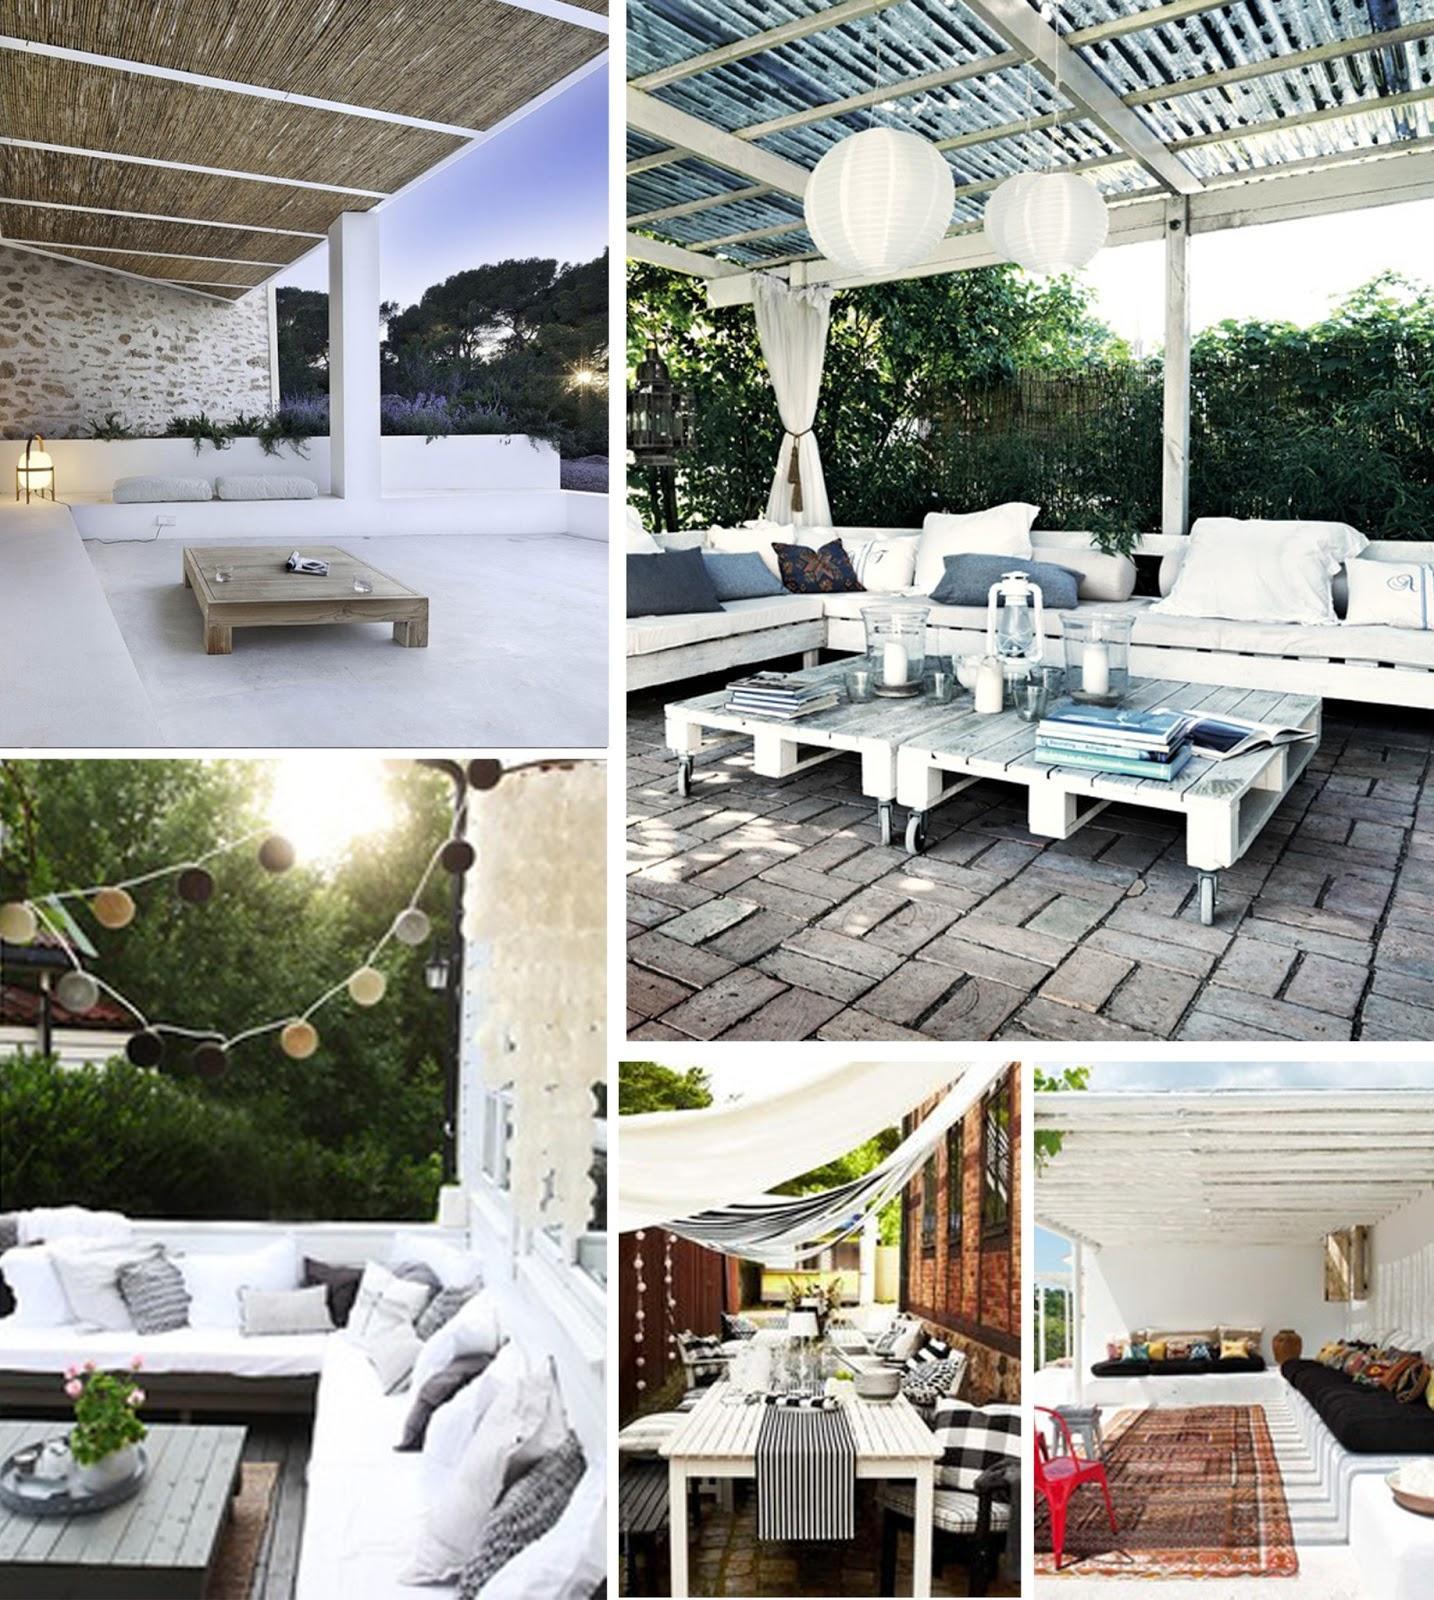 Jardines y terrazas decoreition for Decoracion terrazas modernas